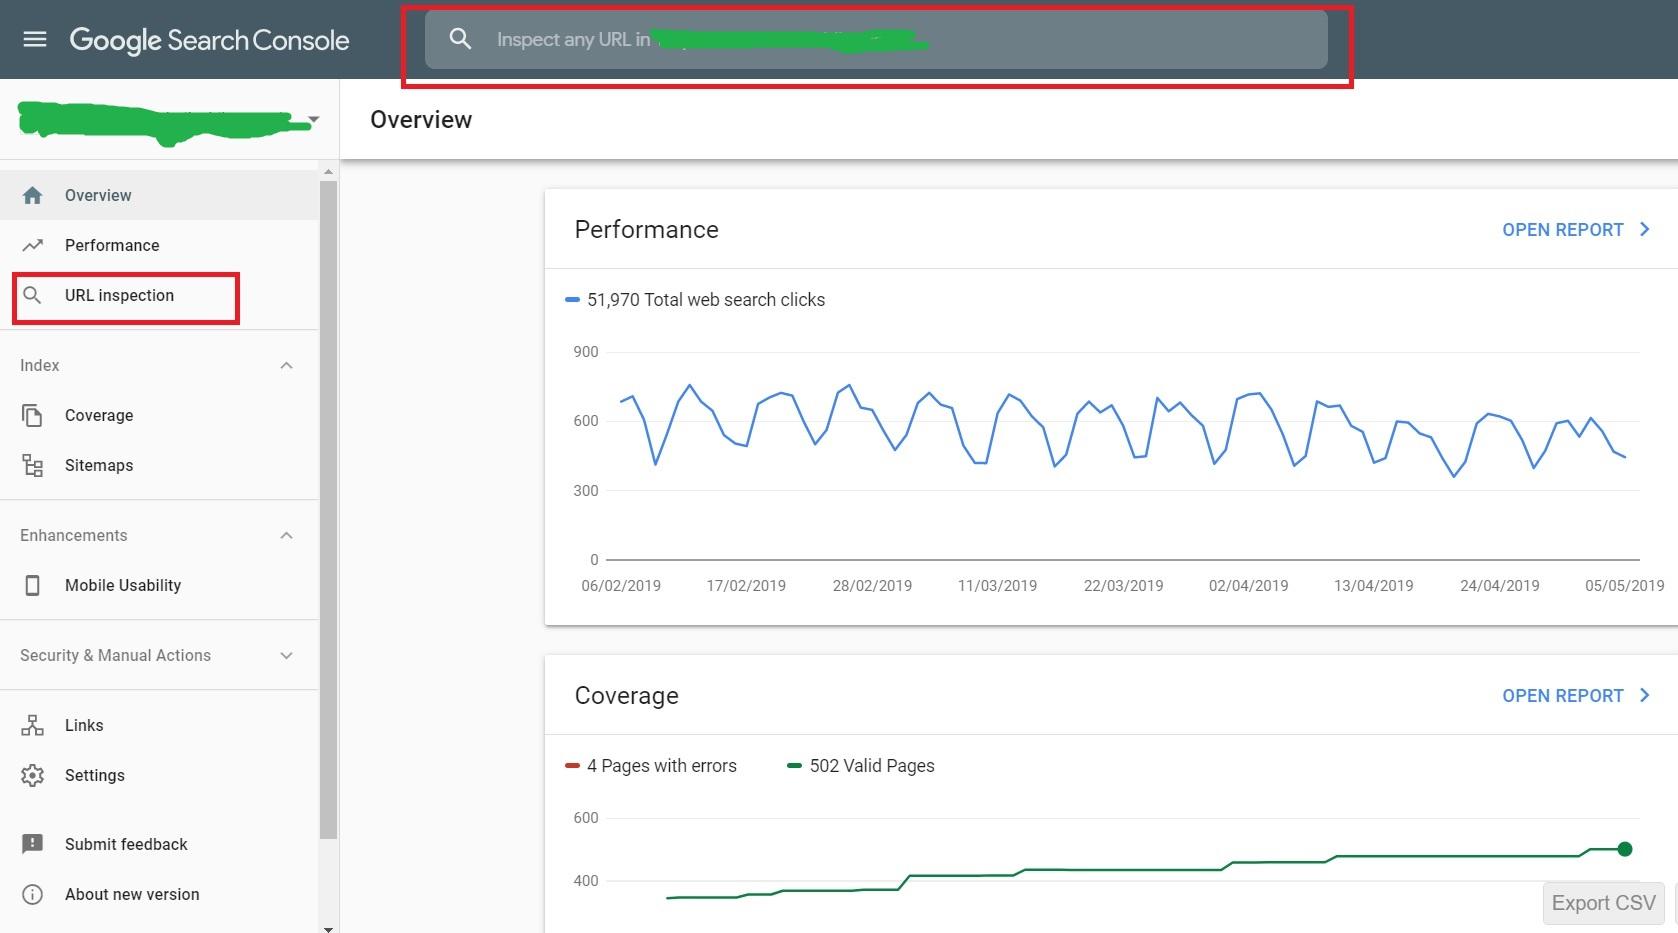 Google Search Console - Inspect URL